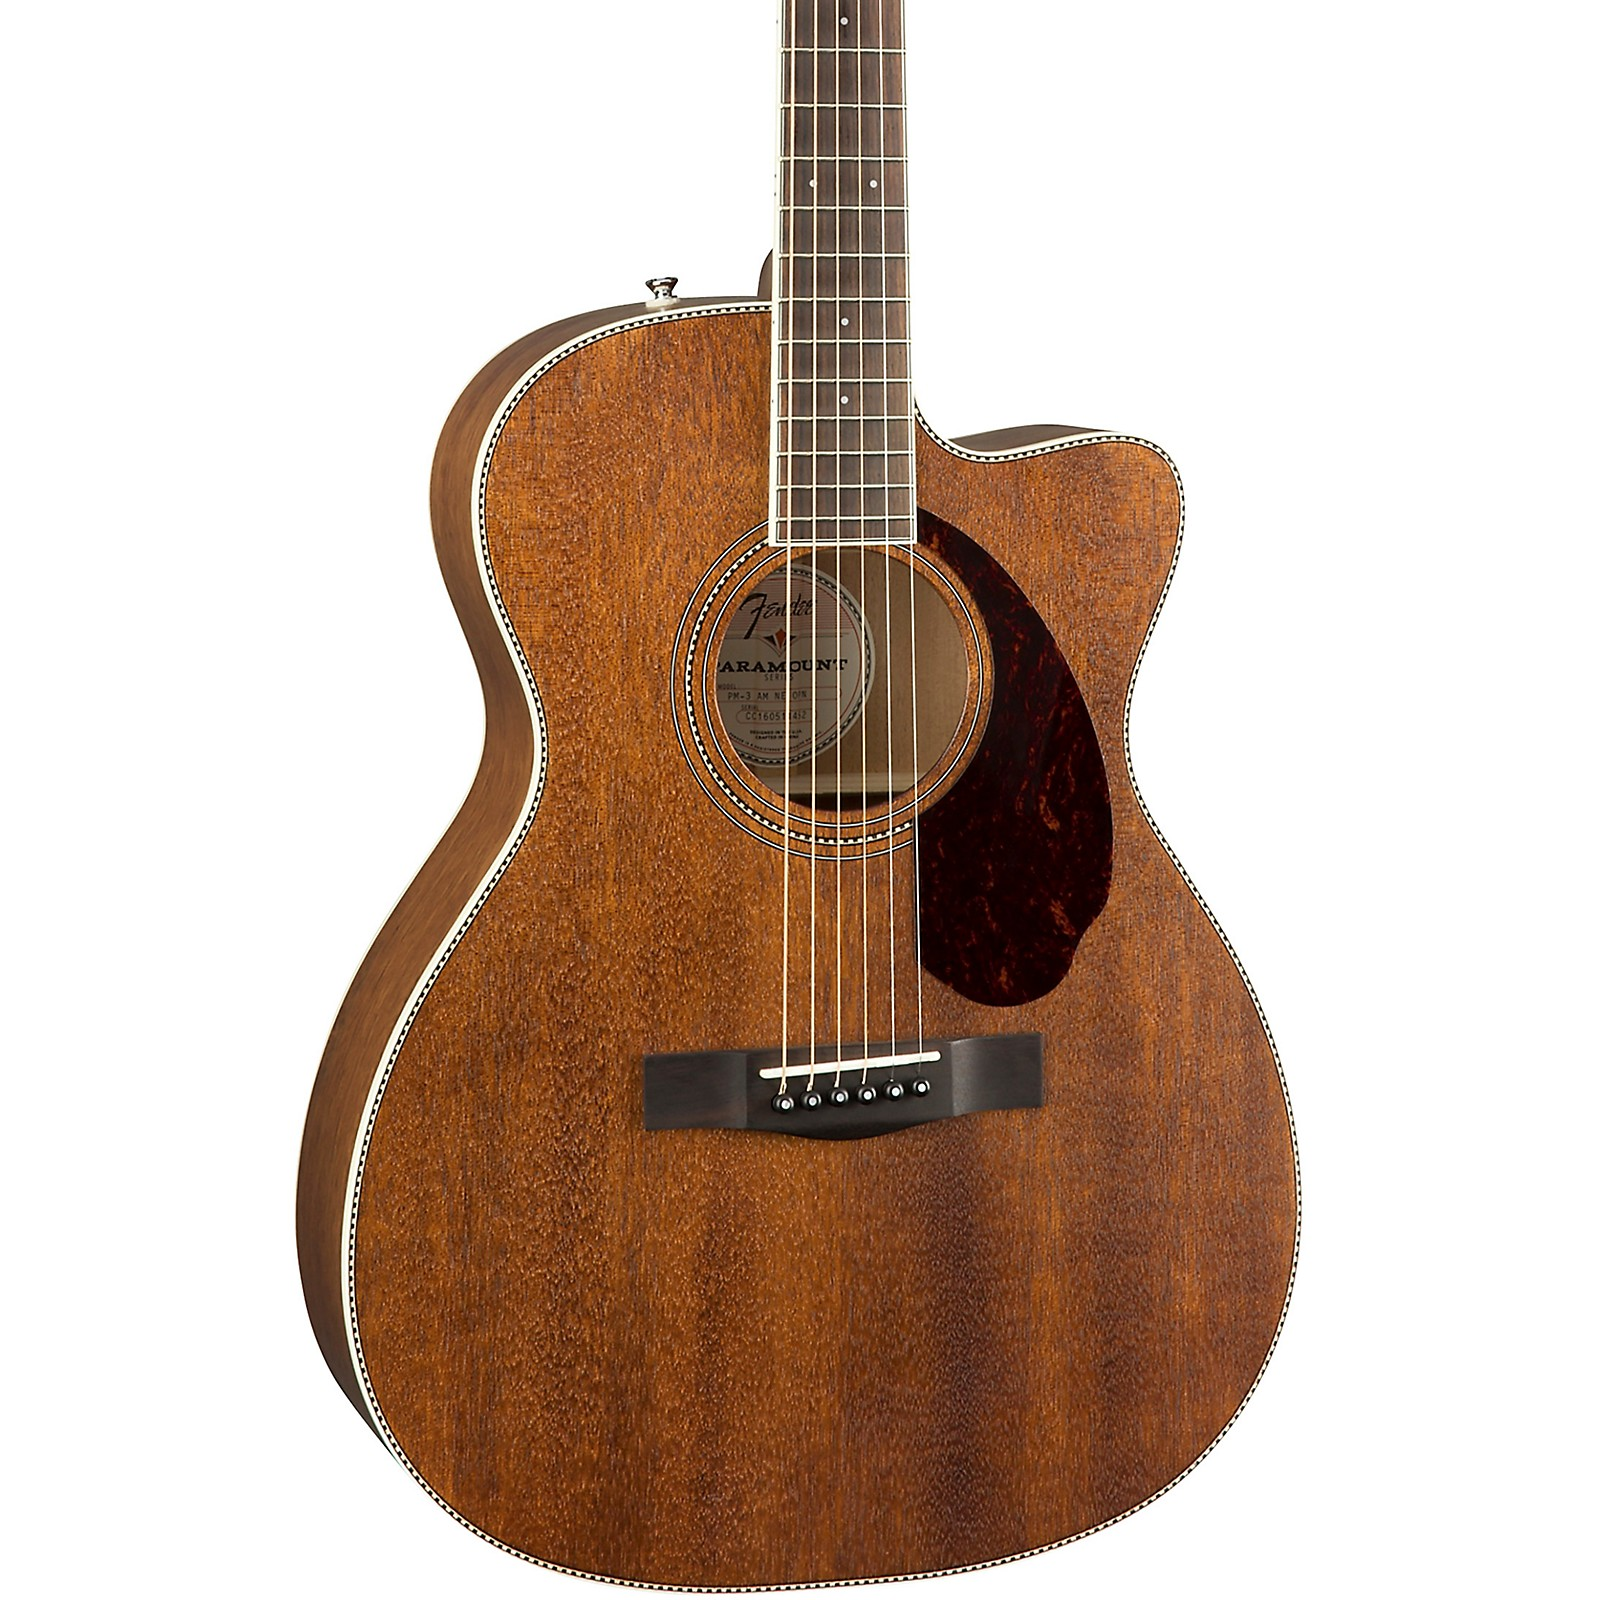 Fender PM-3 Standard Triple-0 All-Mahogany Acoustic Guitar